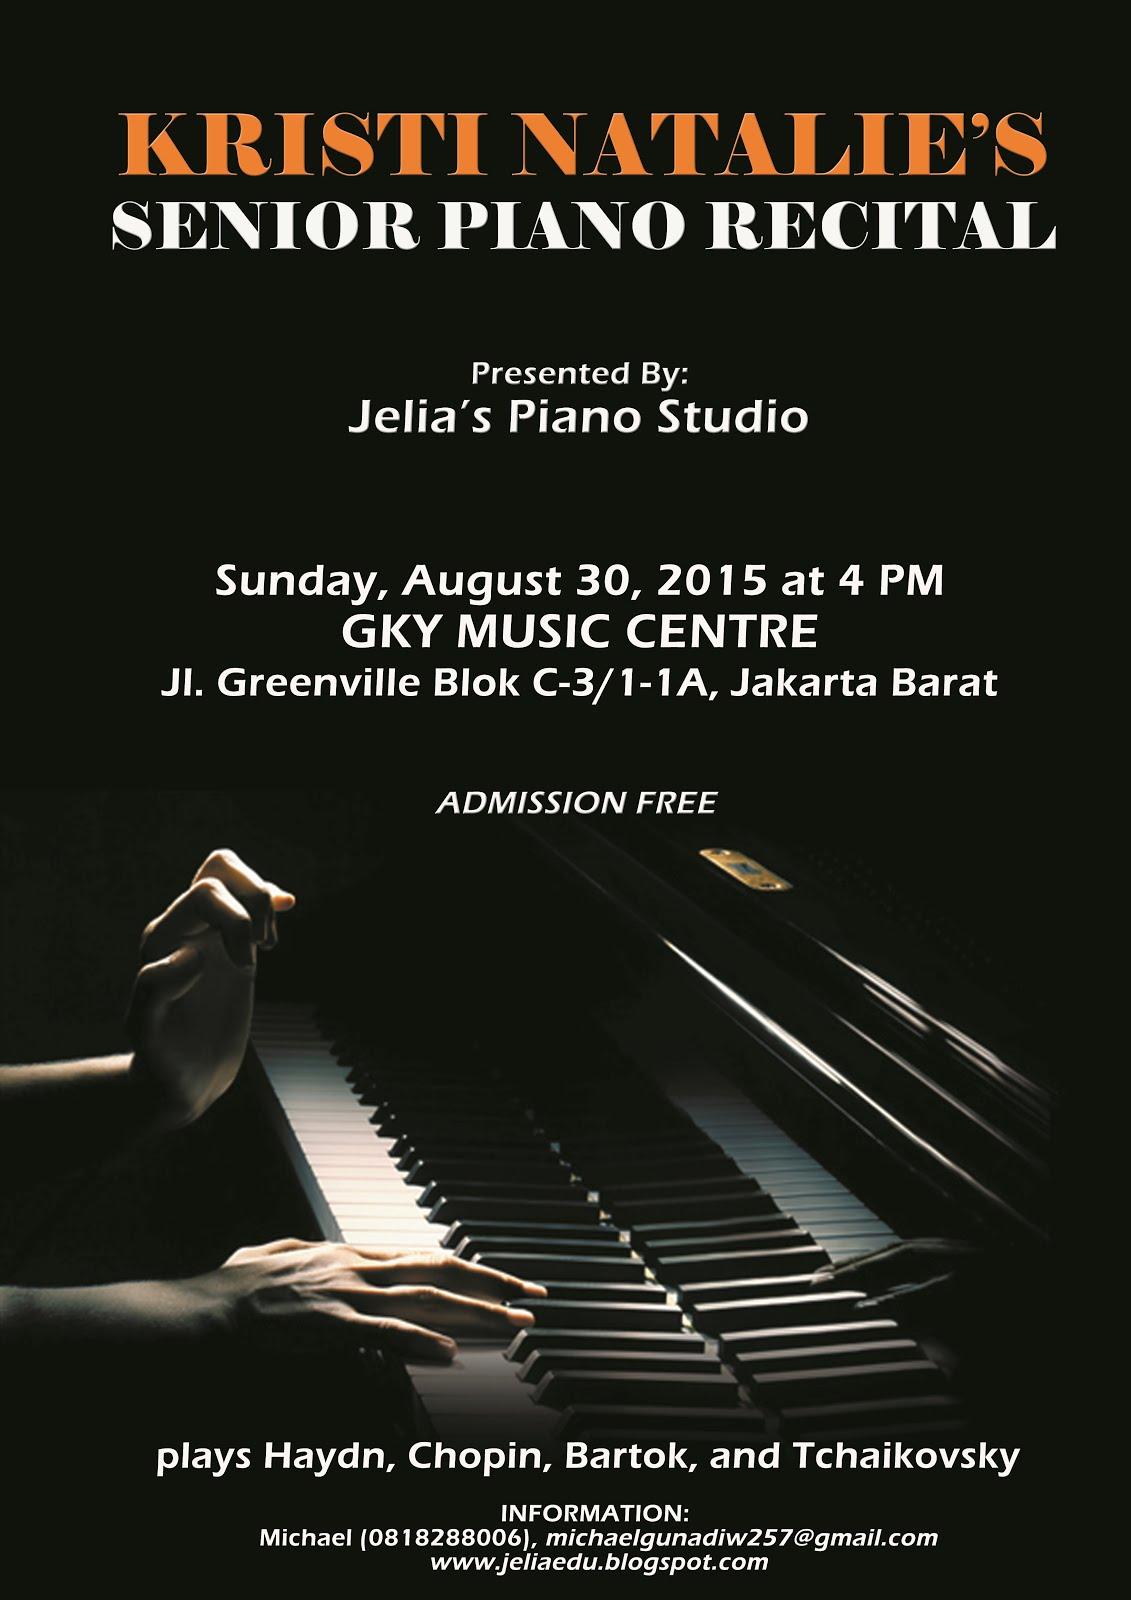 Kristi Natalie's Senior Piano Recital